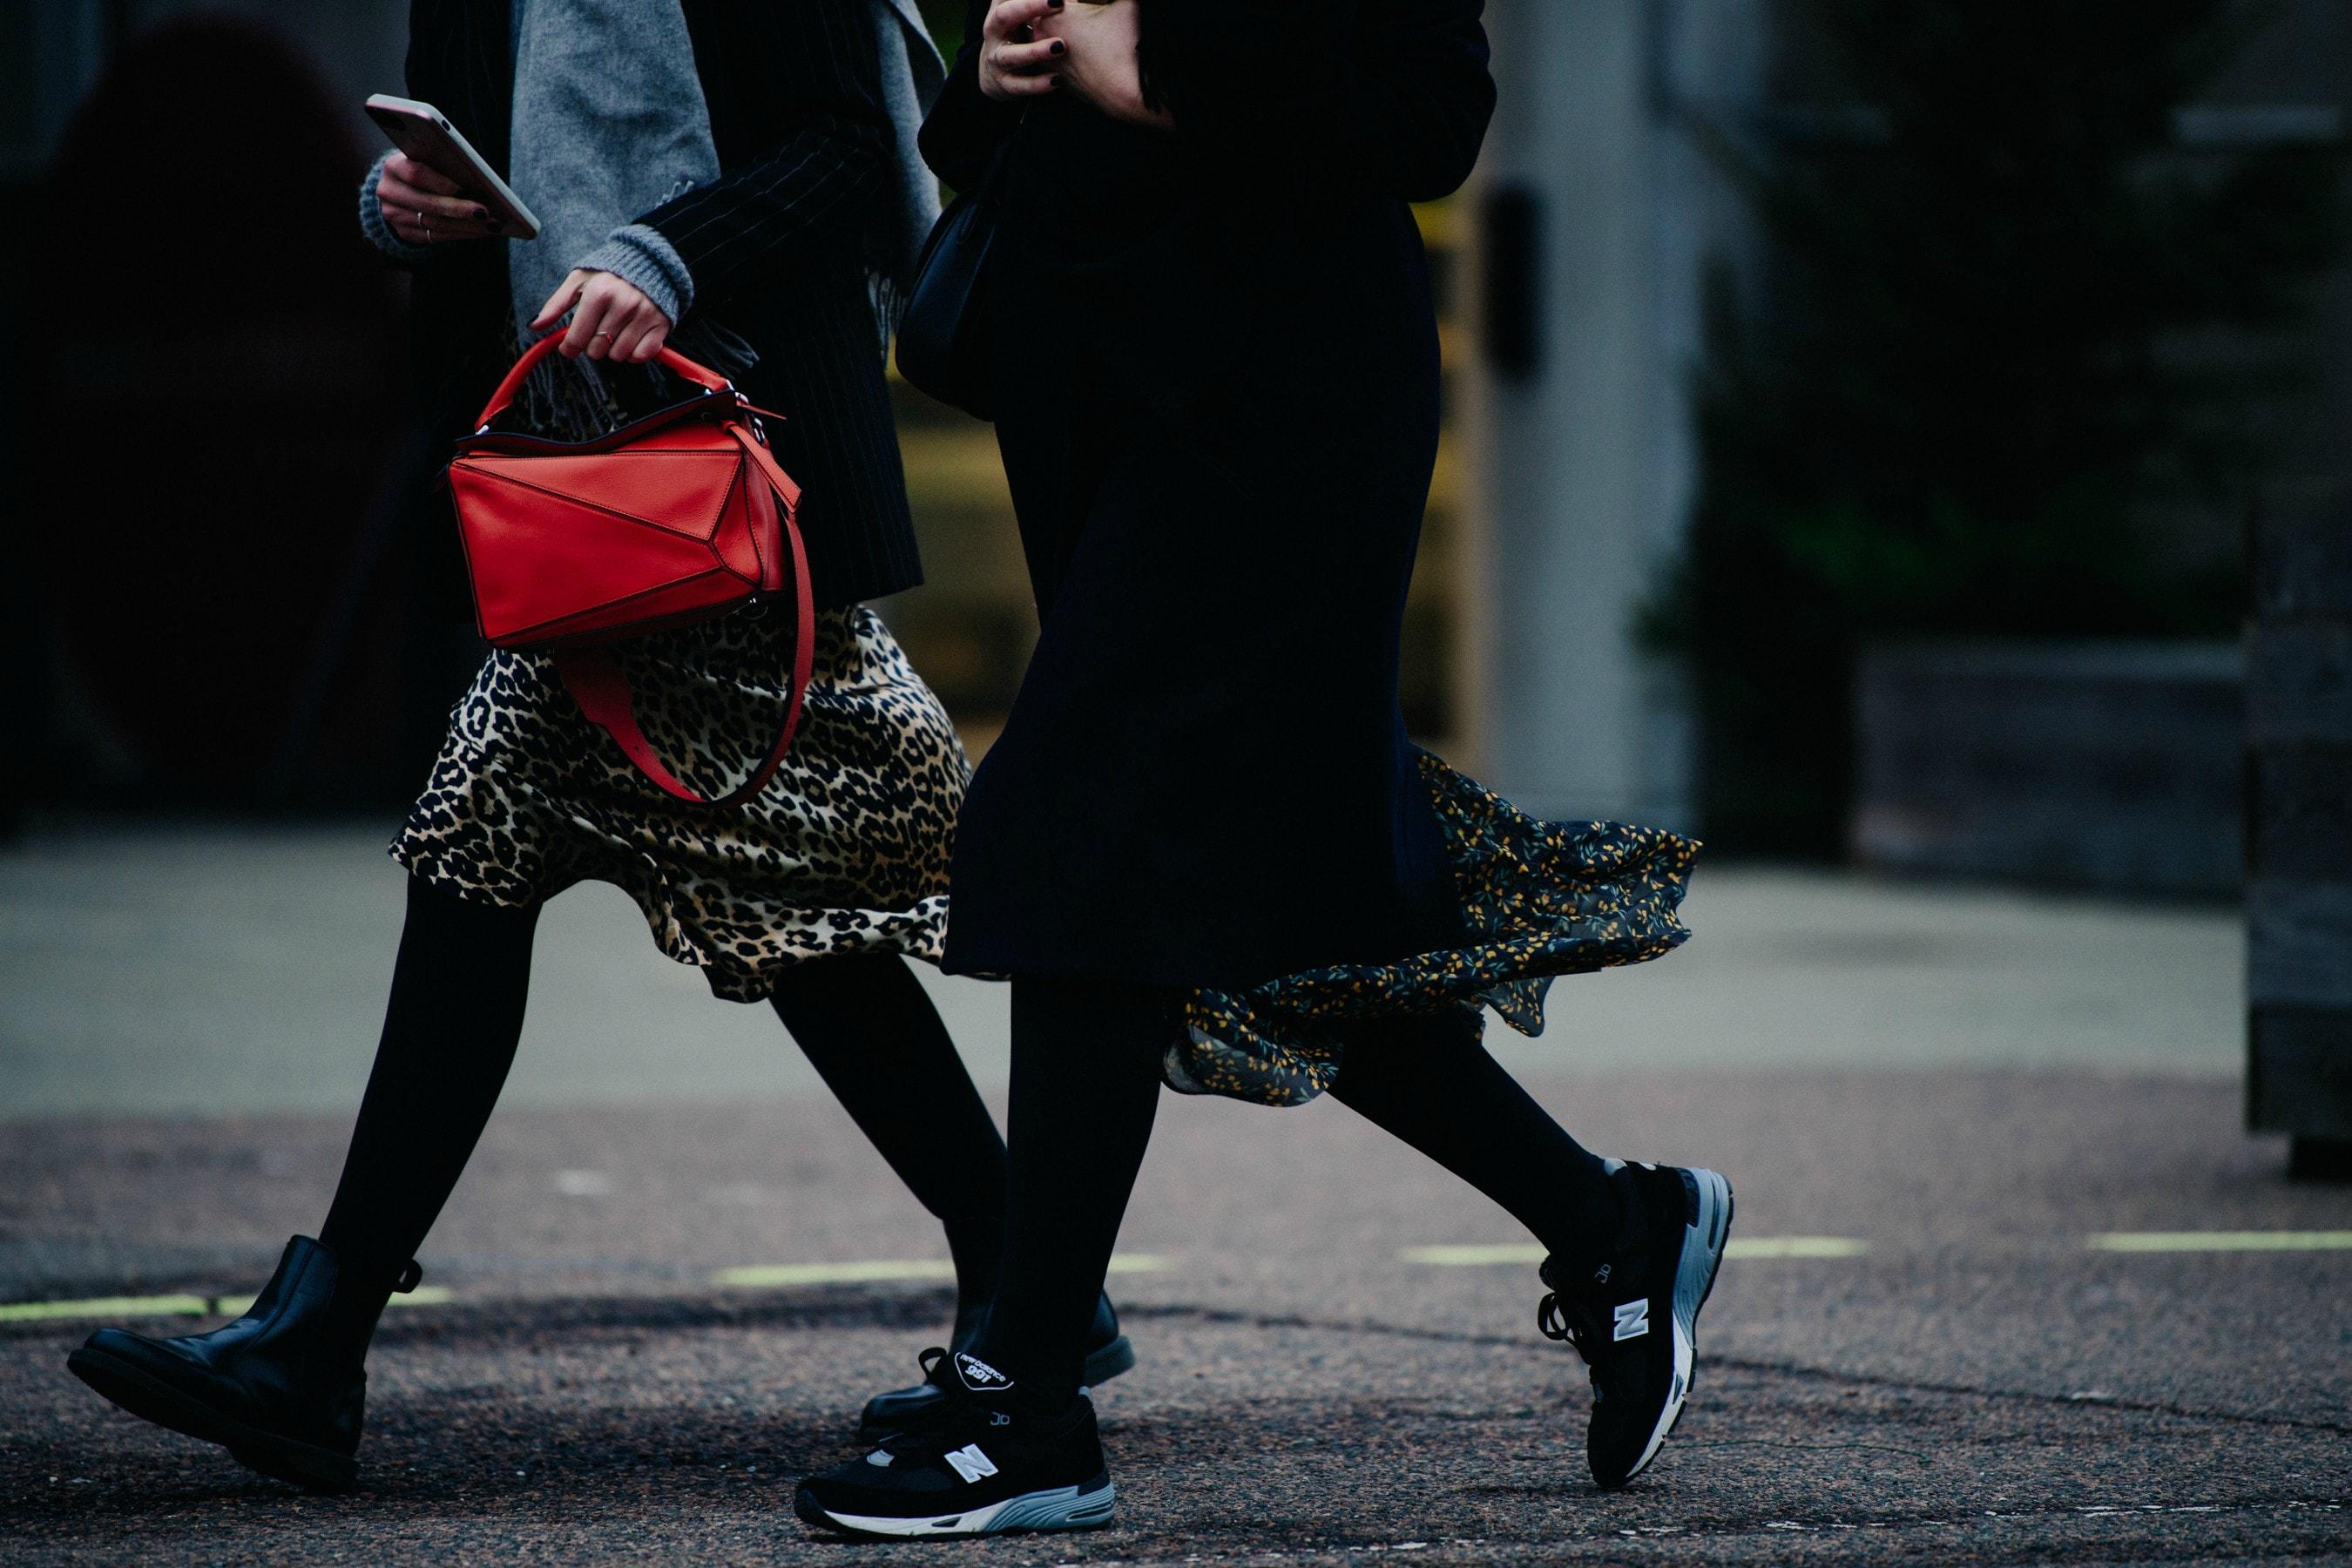 Capturing The Style Of Copenhagen With Fashion Photographer Adam Sinding